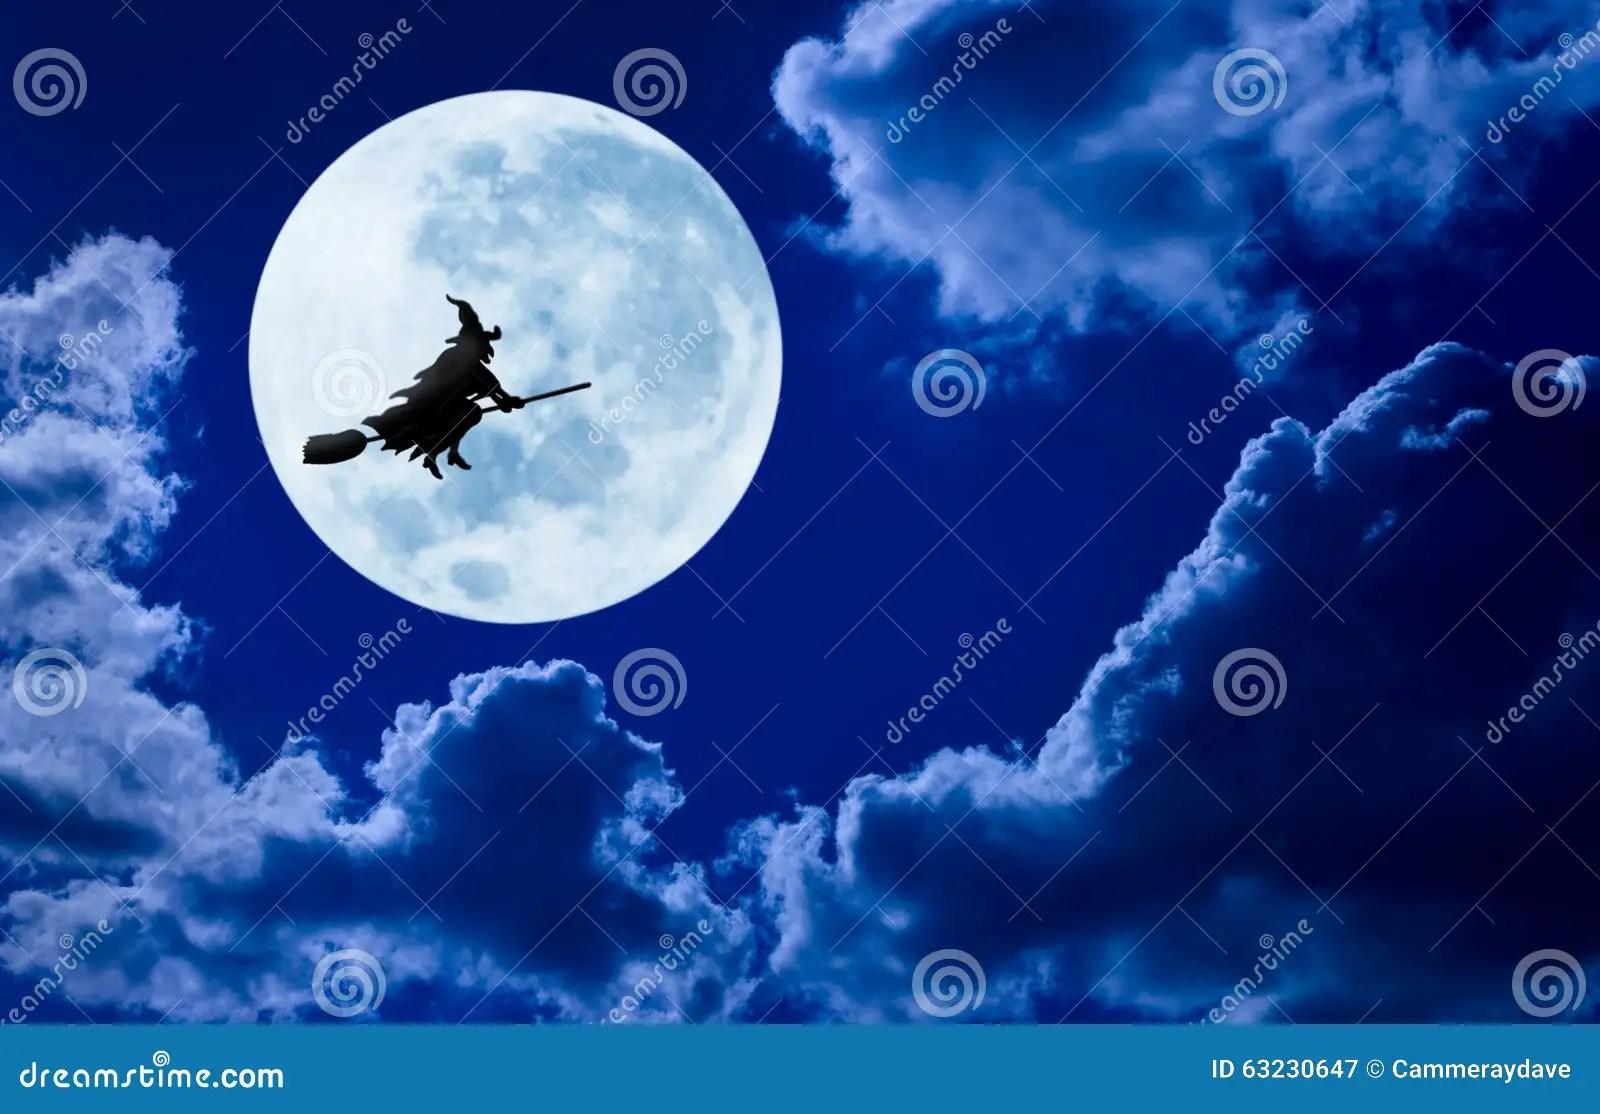 Halloween Witch Flying Moon Sky Stock Image Image Of